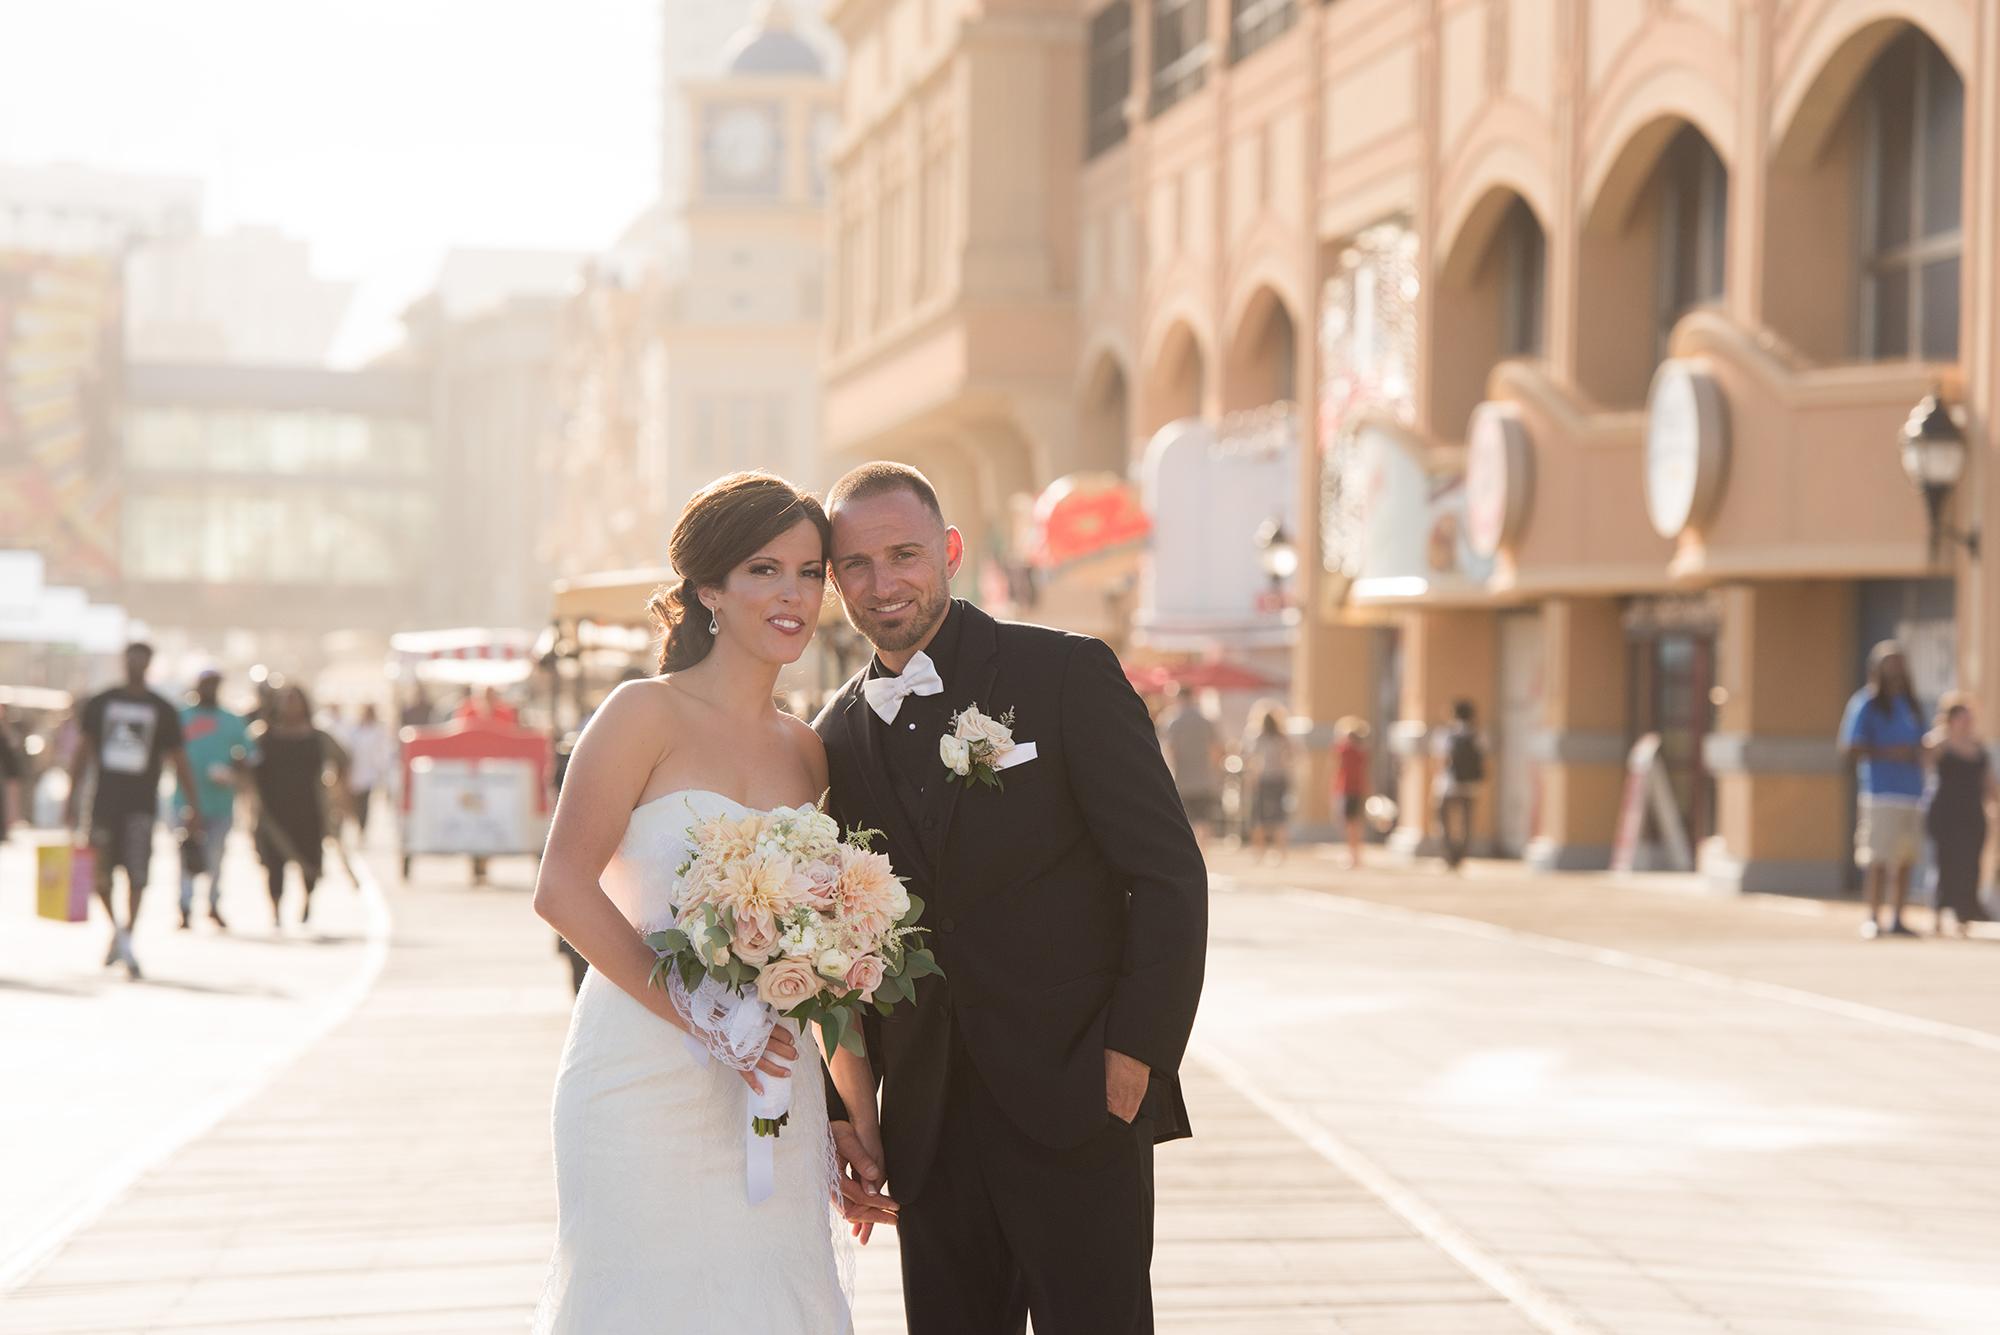 lbi-photographer-ac-wedding-claridge-val-22.jpg